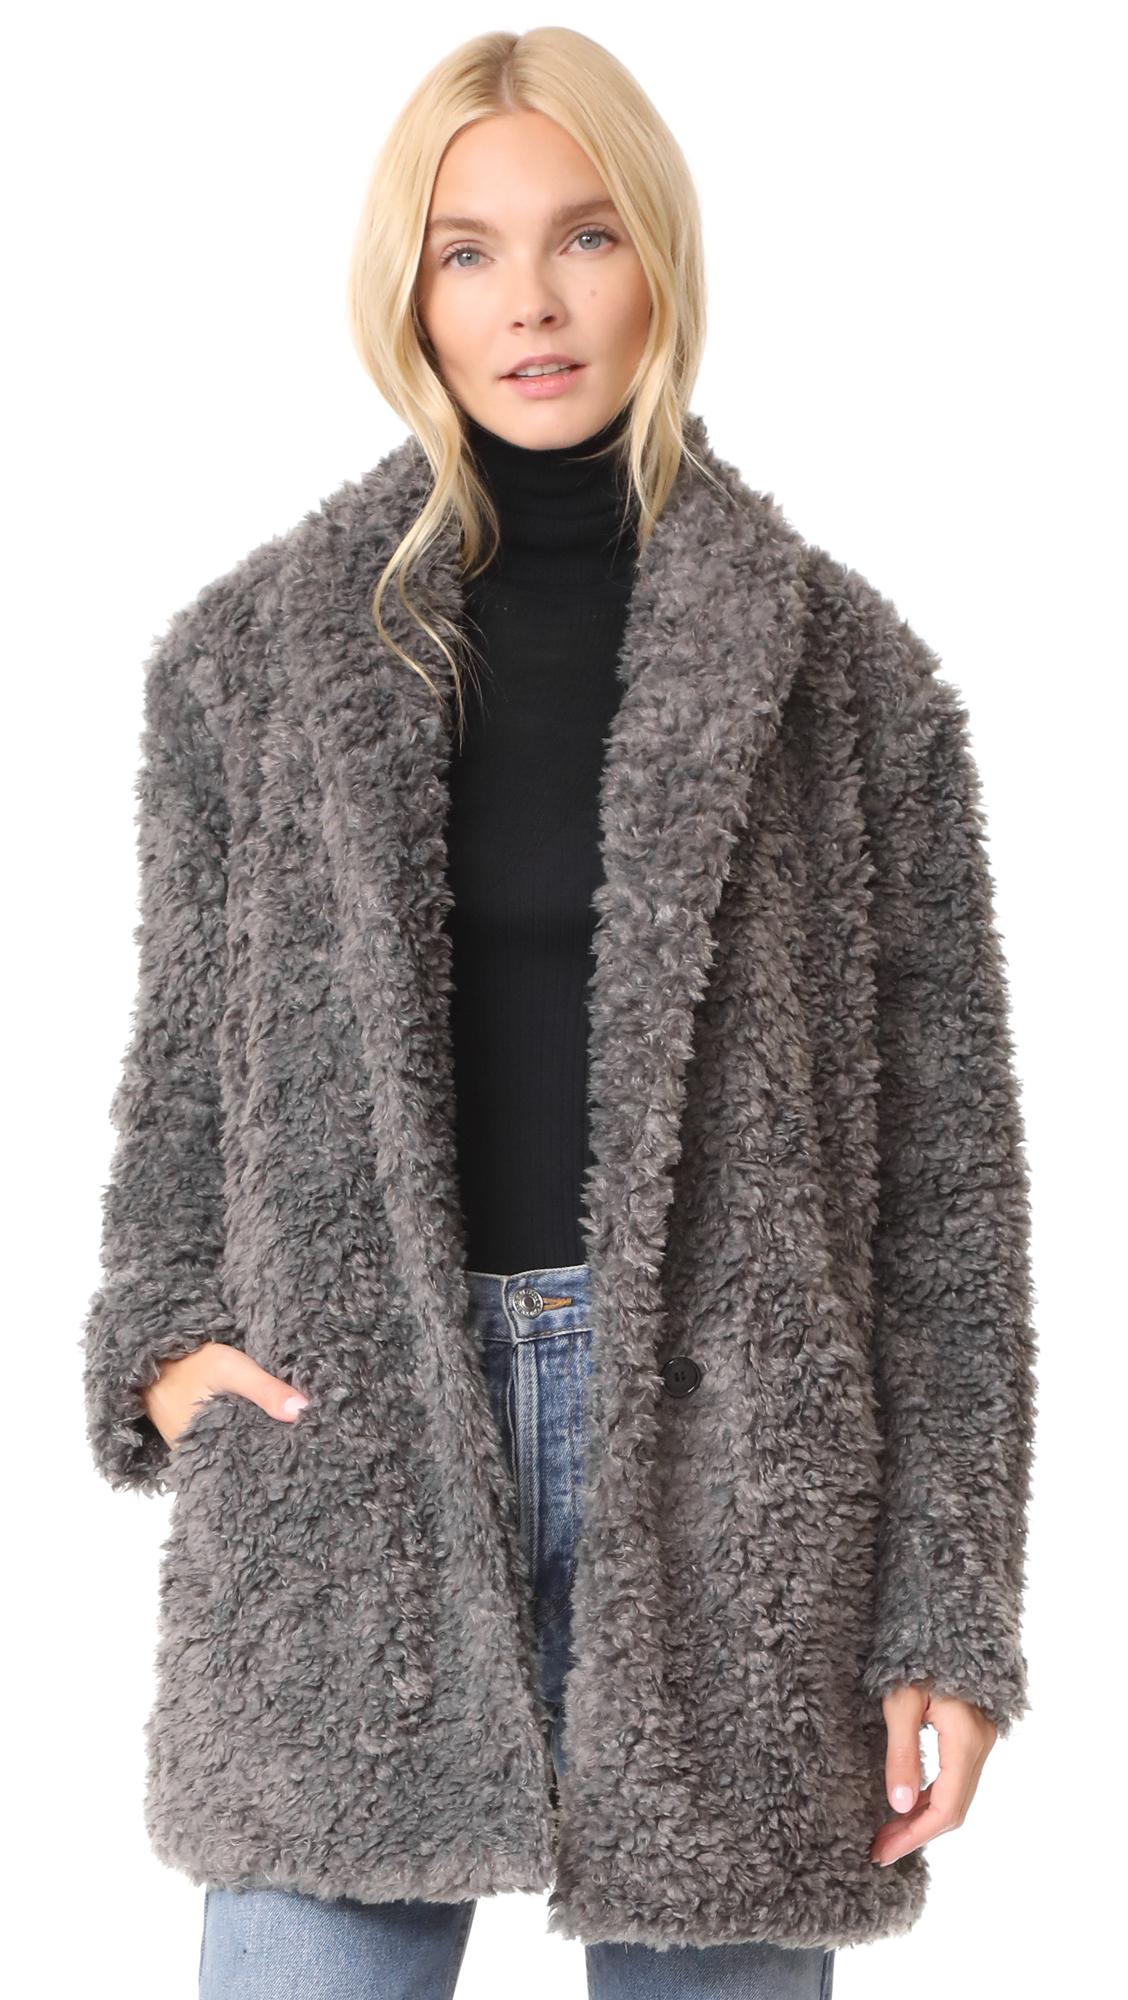 Joie Kavasia Coat - Dove Grey